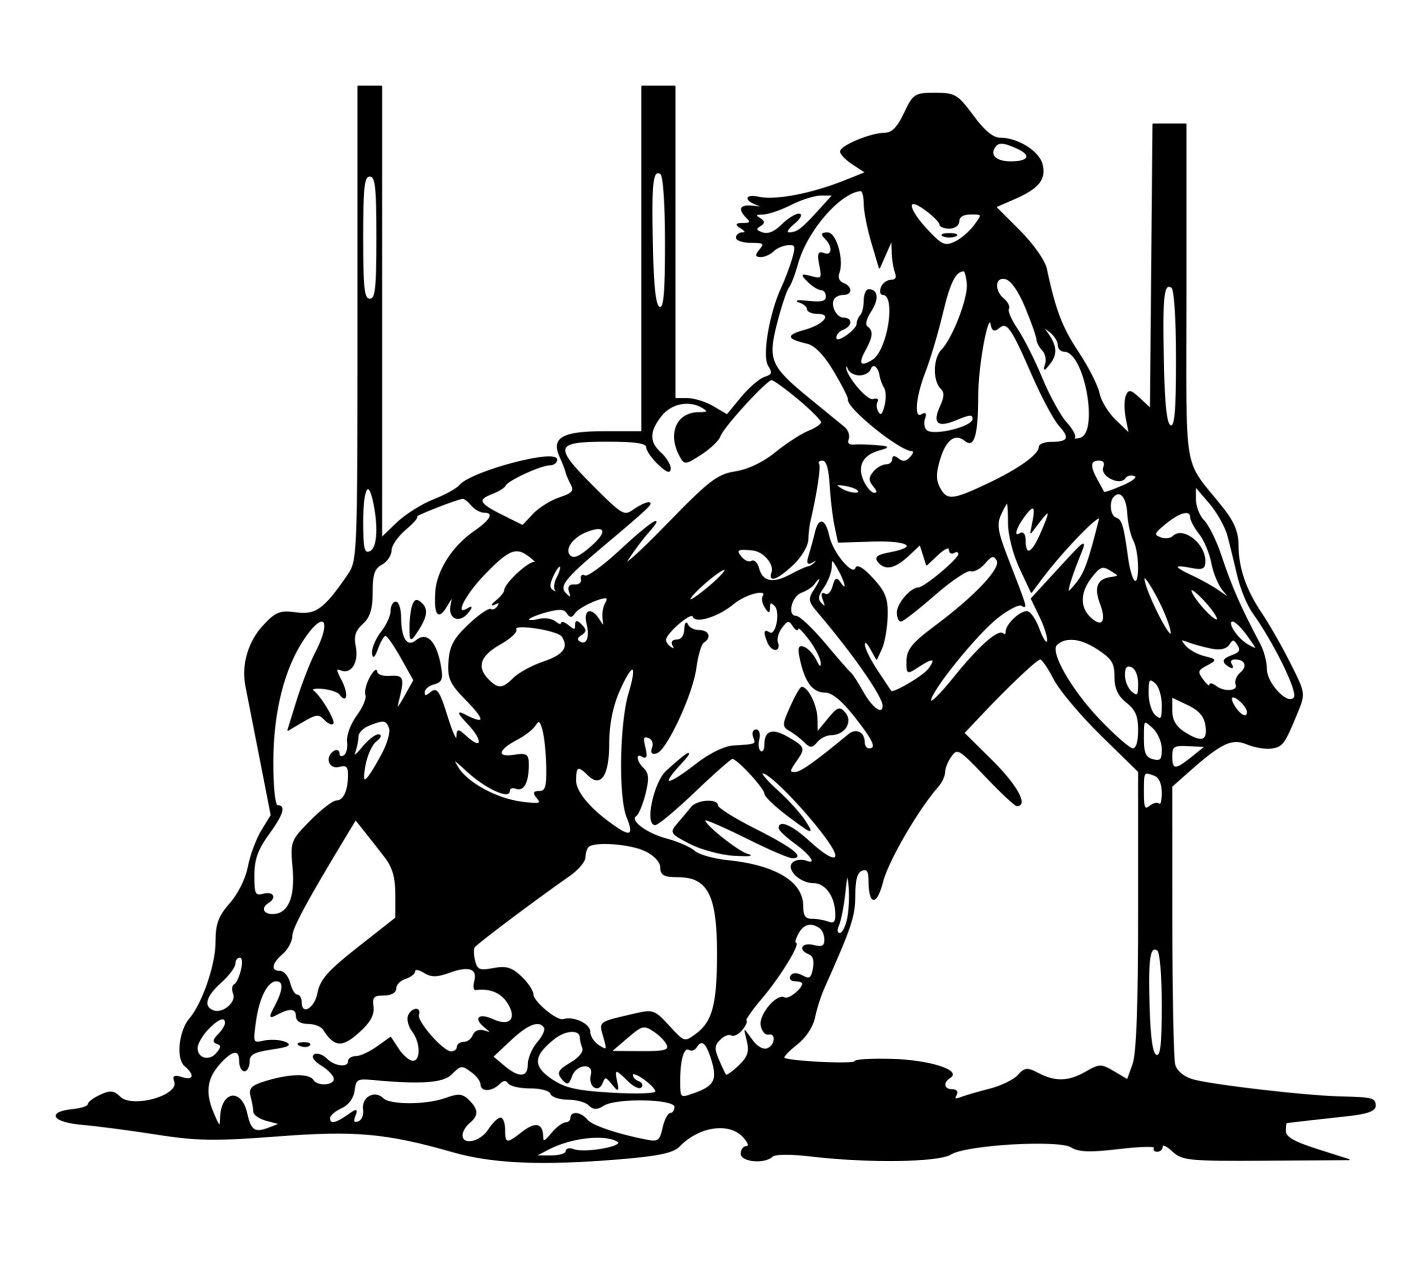 Saddle Bronc Rodeo Rider Cowboy Western Vinyl Decal Free Shipping 002